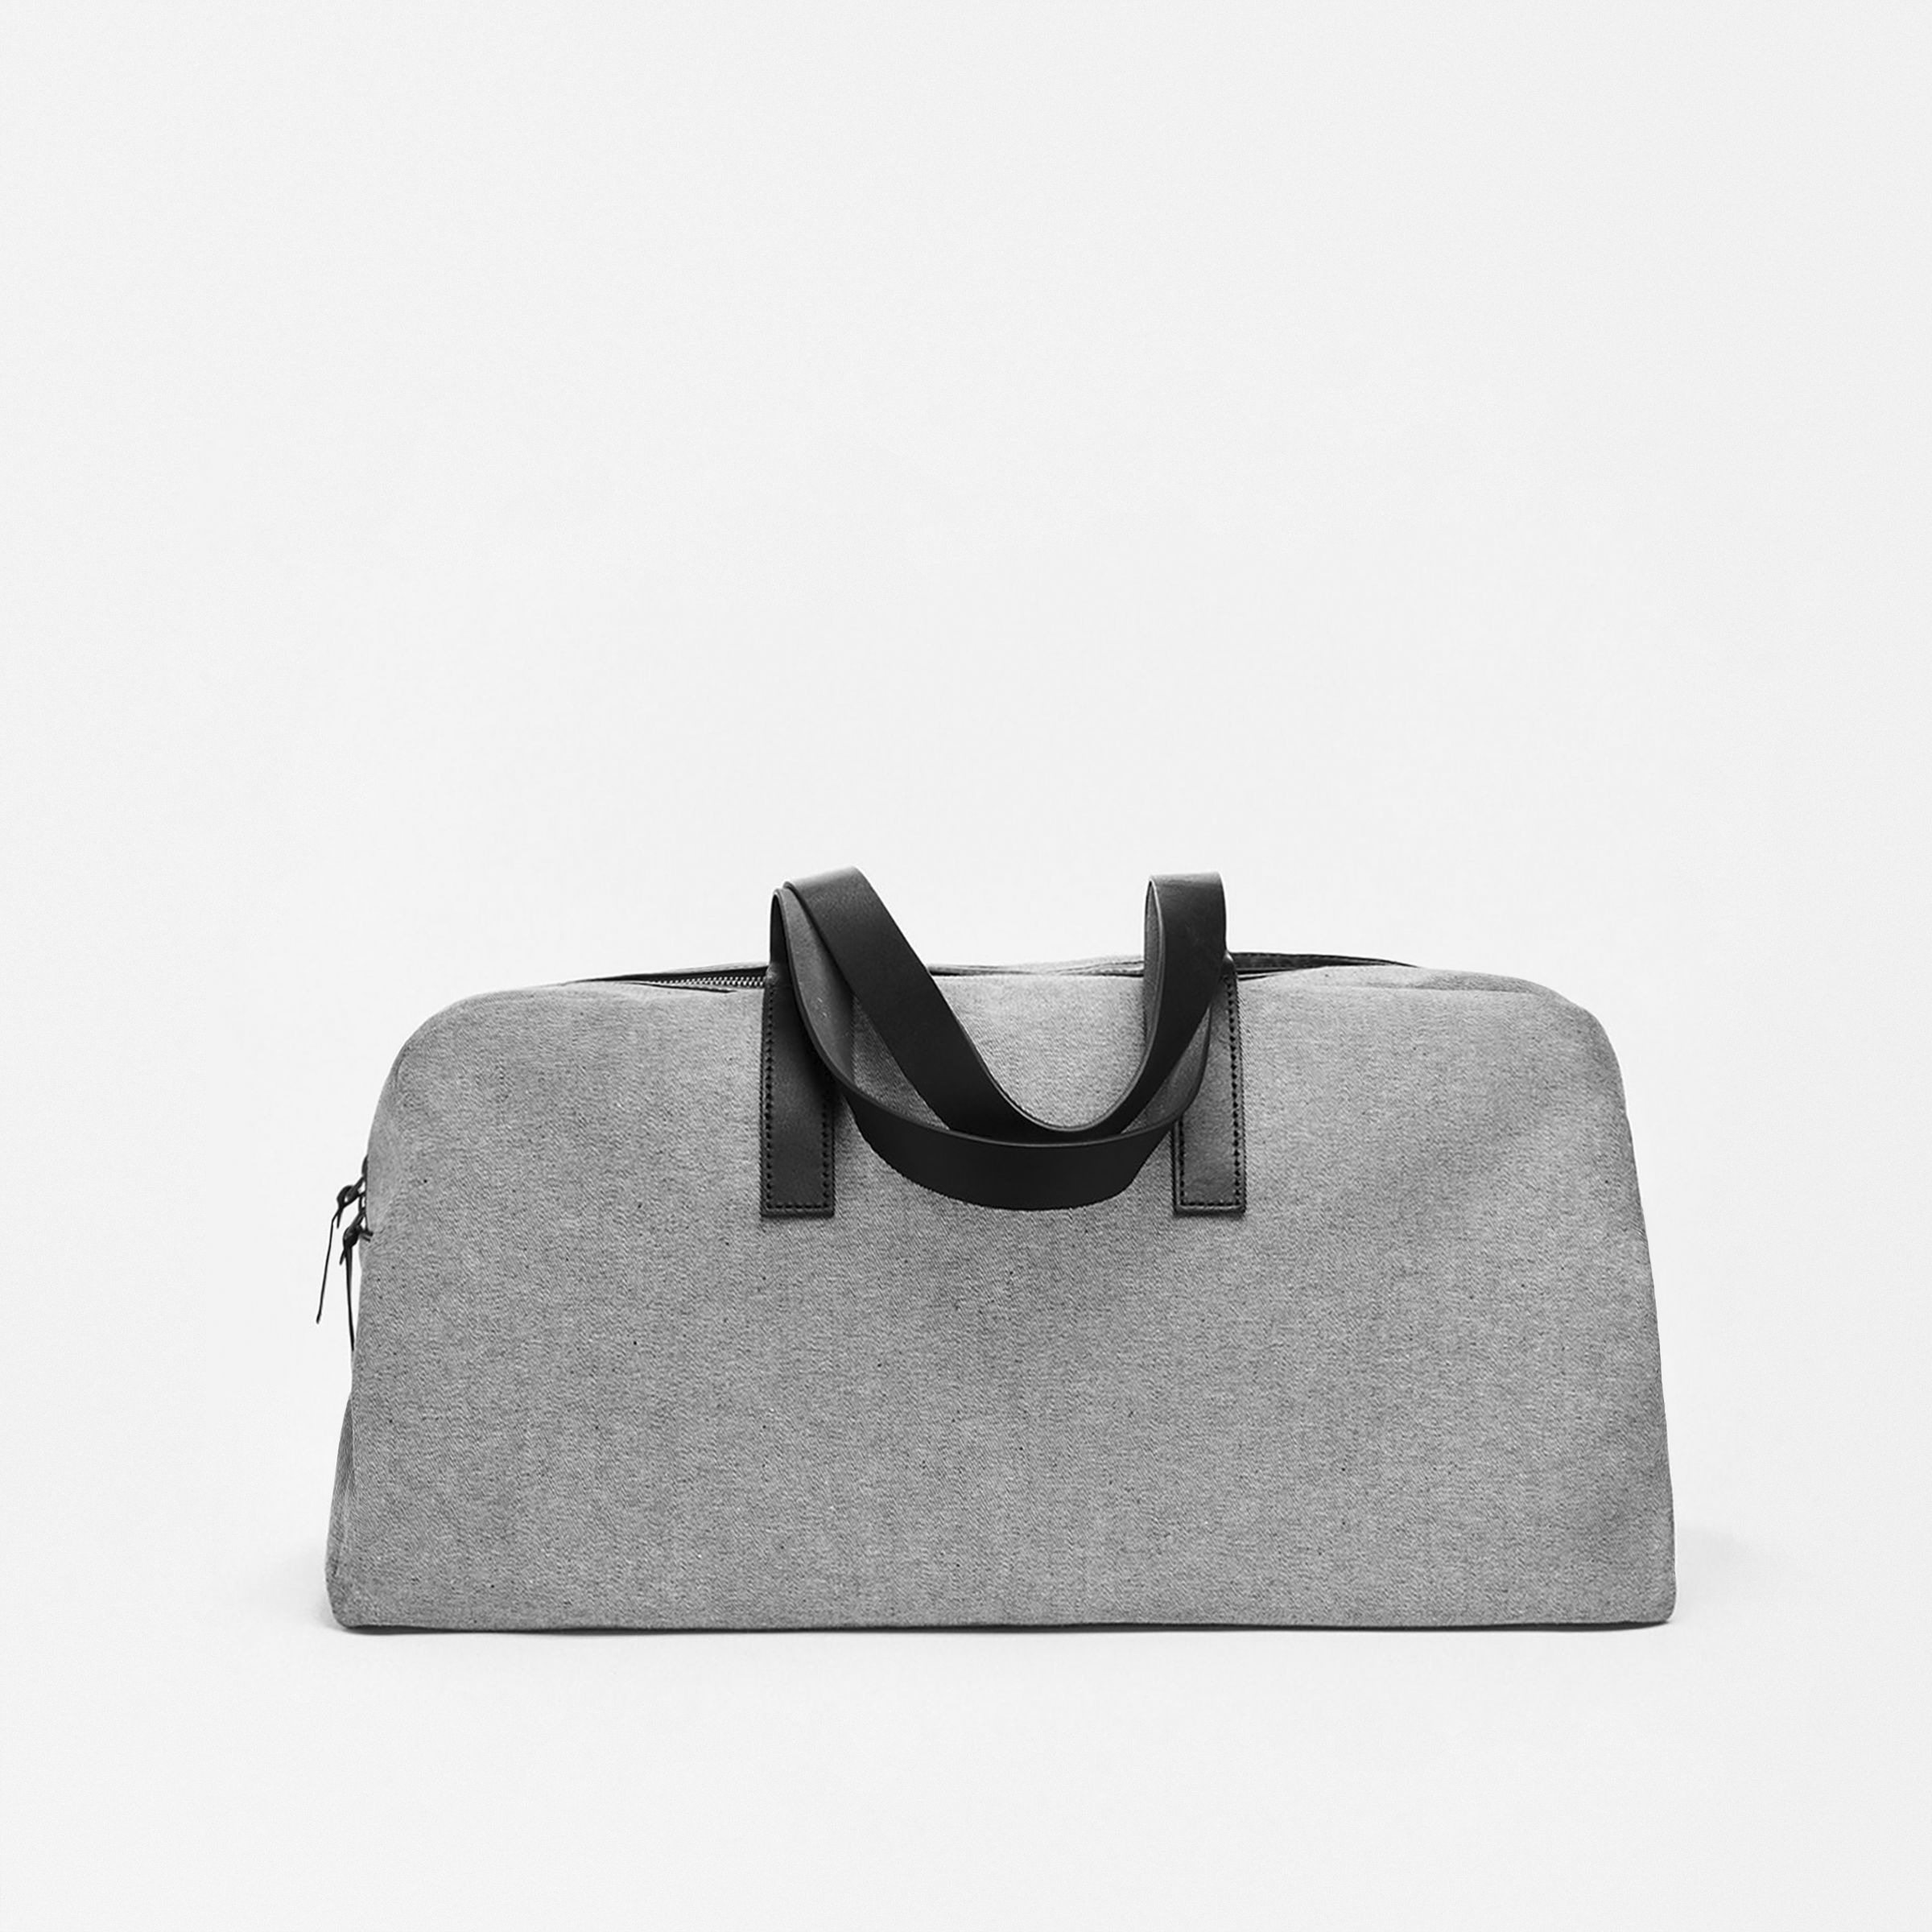 397191e75 12 Best Weekender Bags 2019 - Duffel, Carryall Bags for Men